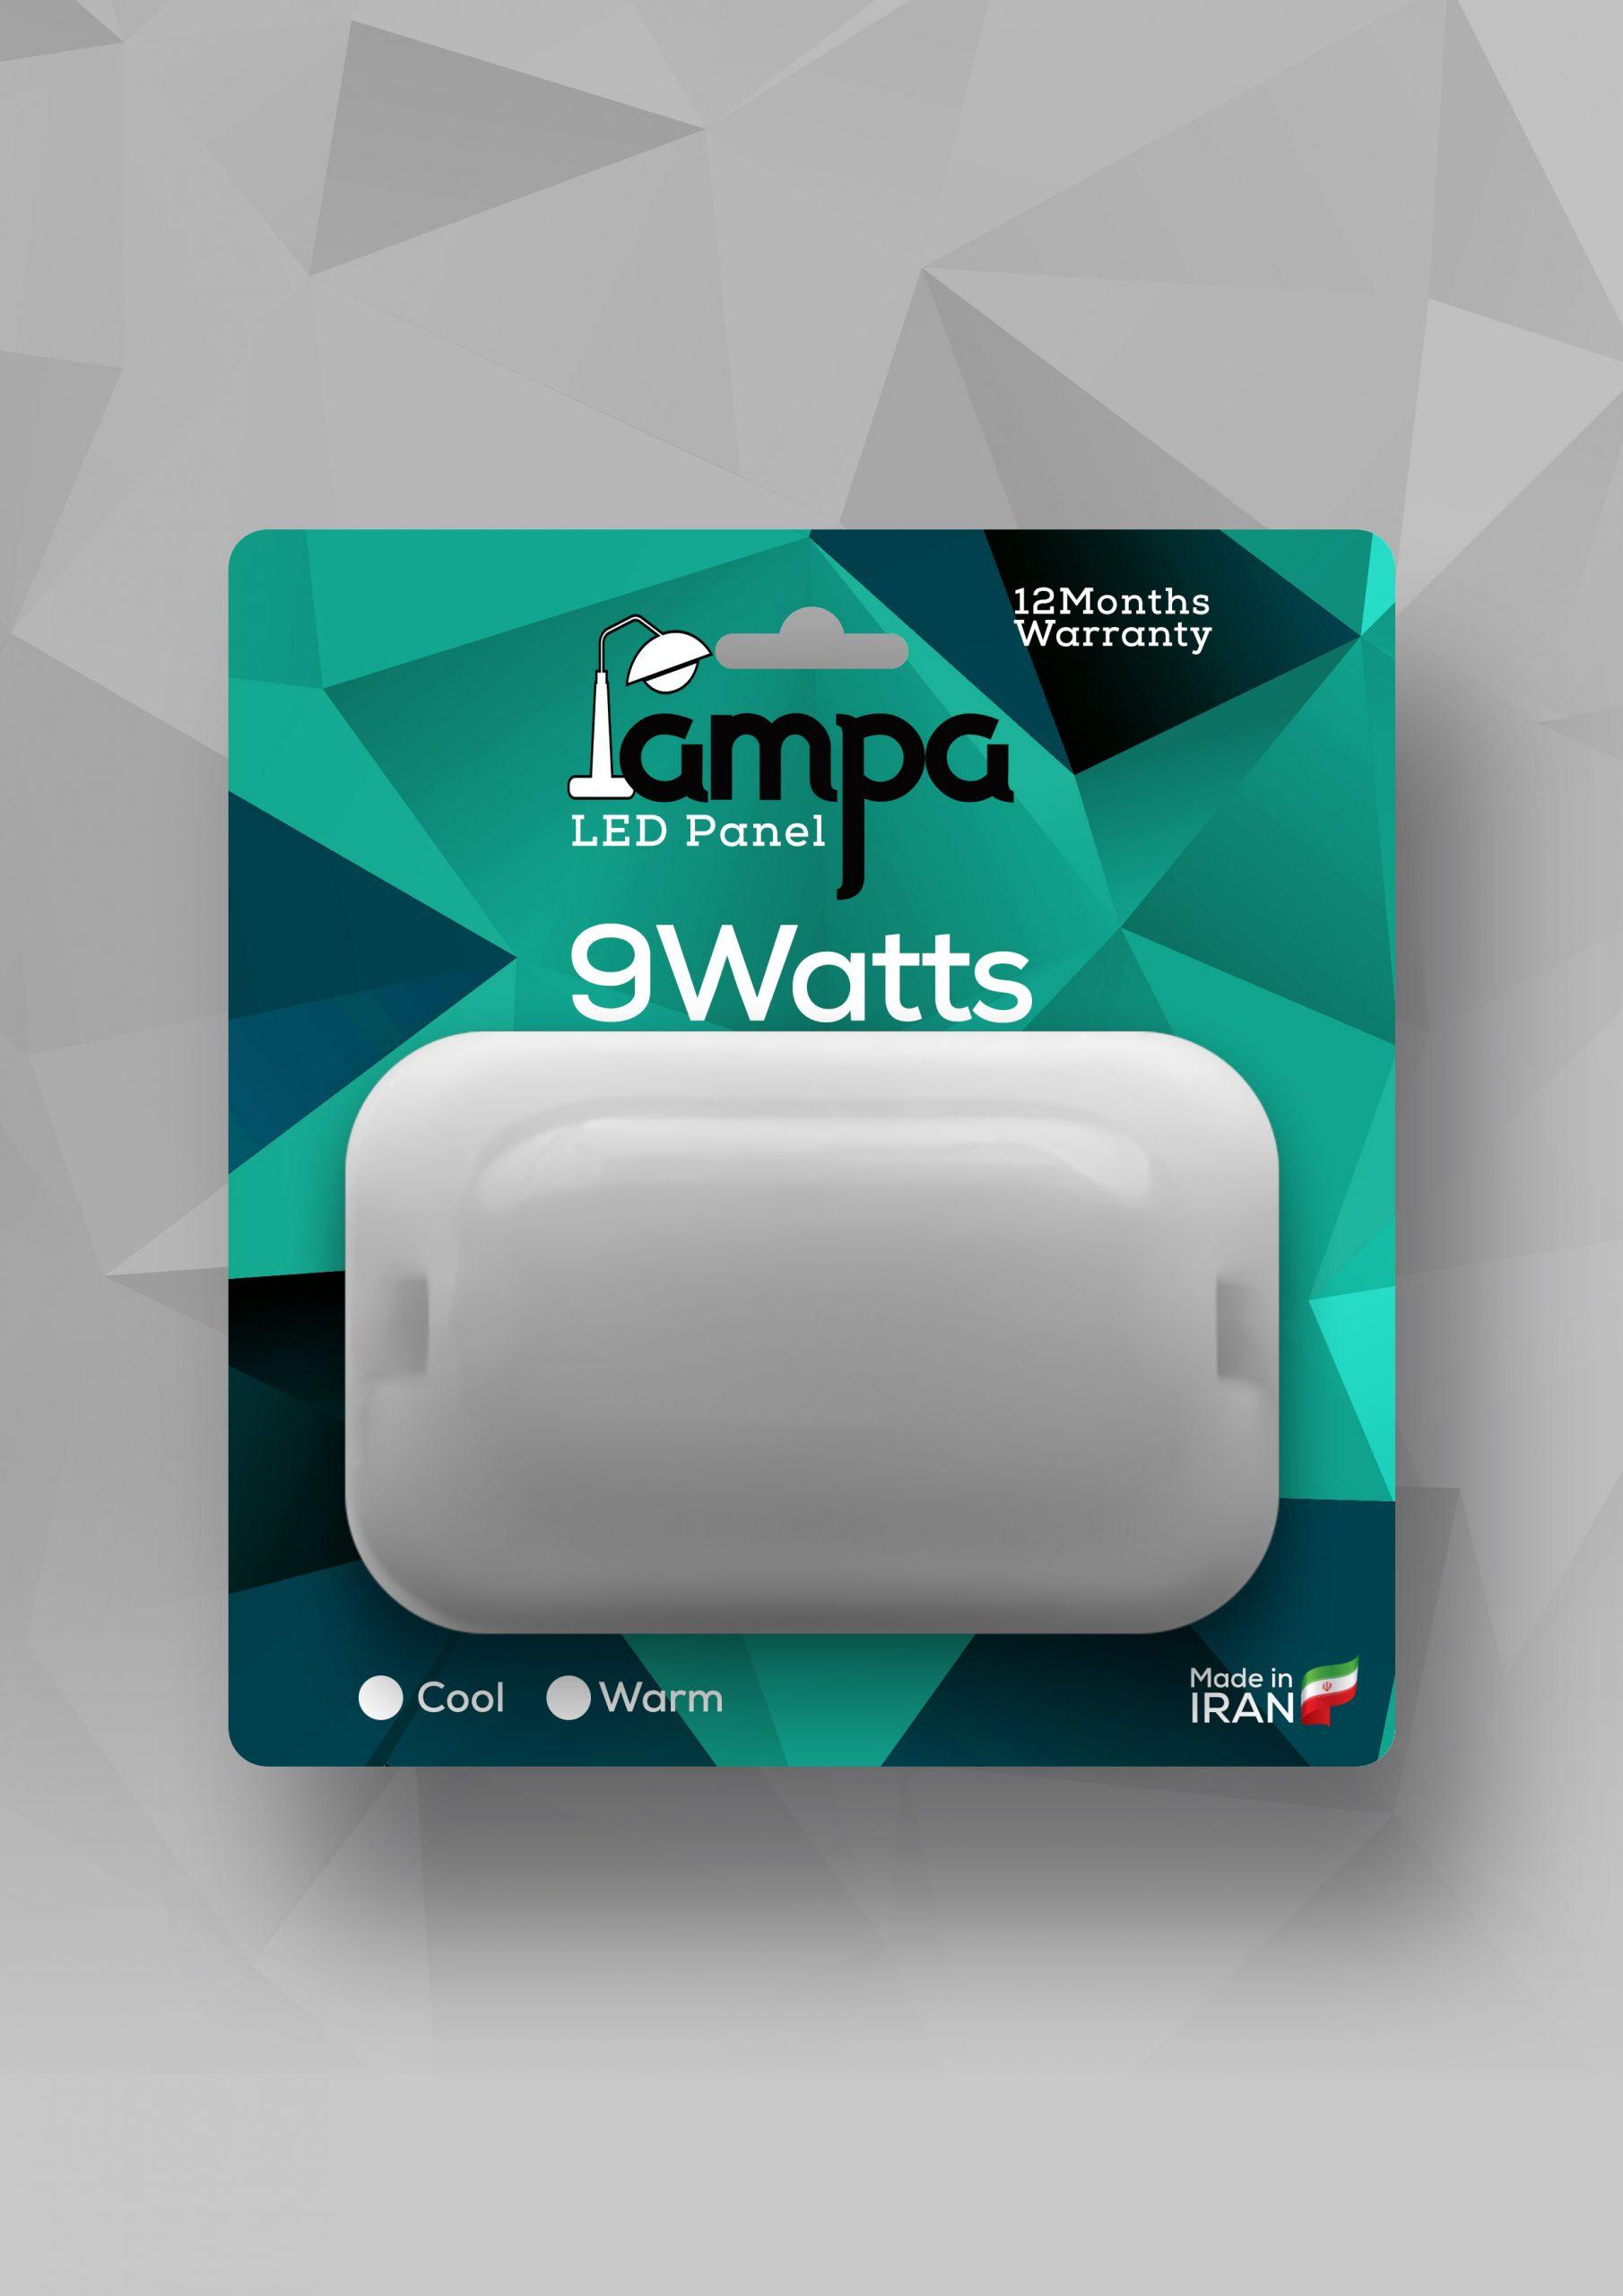 طراحی بسته بندی پنل ال ای دی لامپا